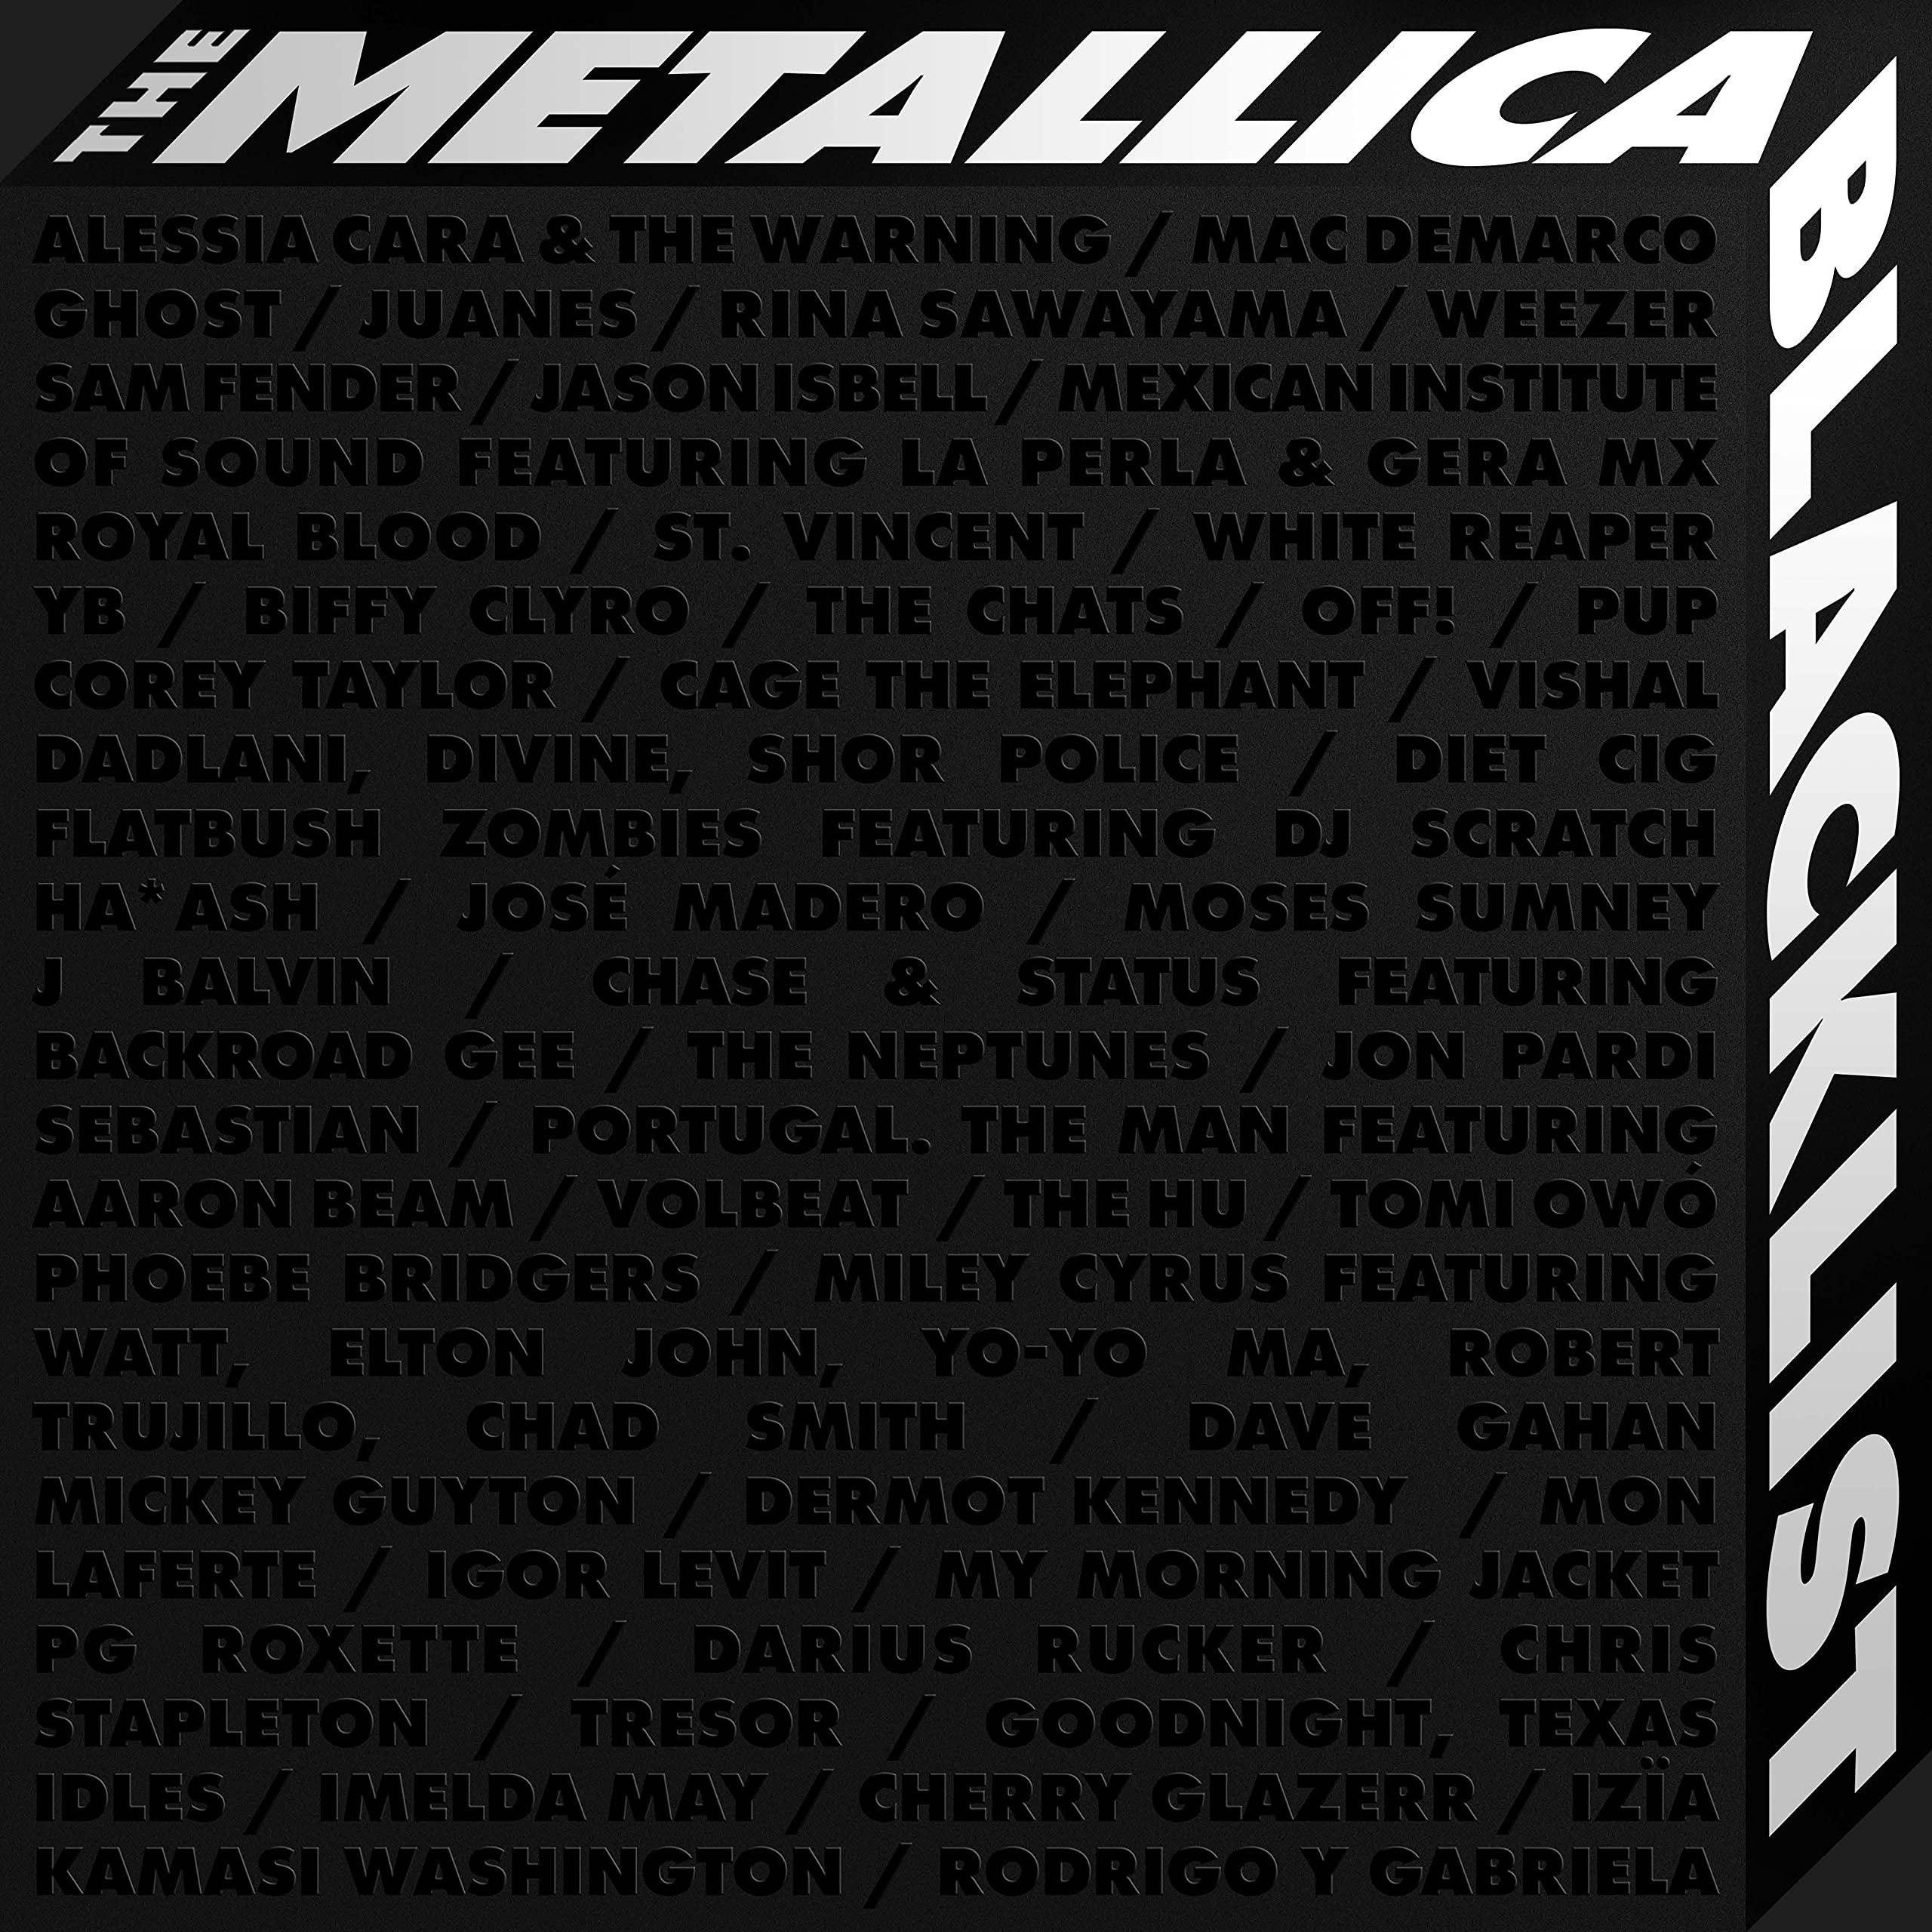 Book Cover: The Metallica Blacklist